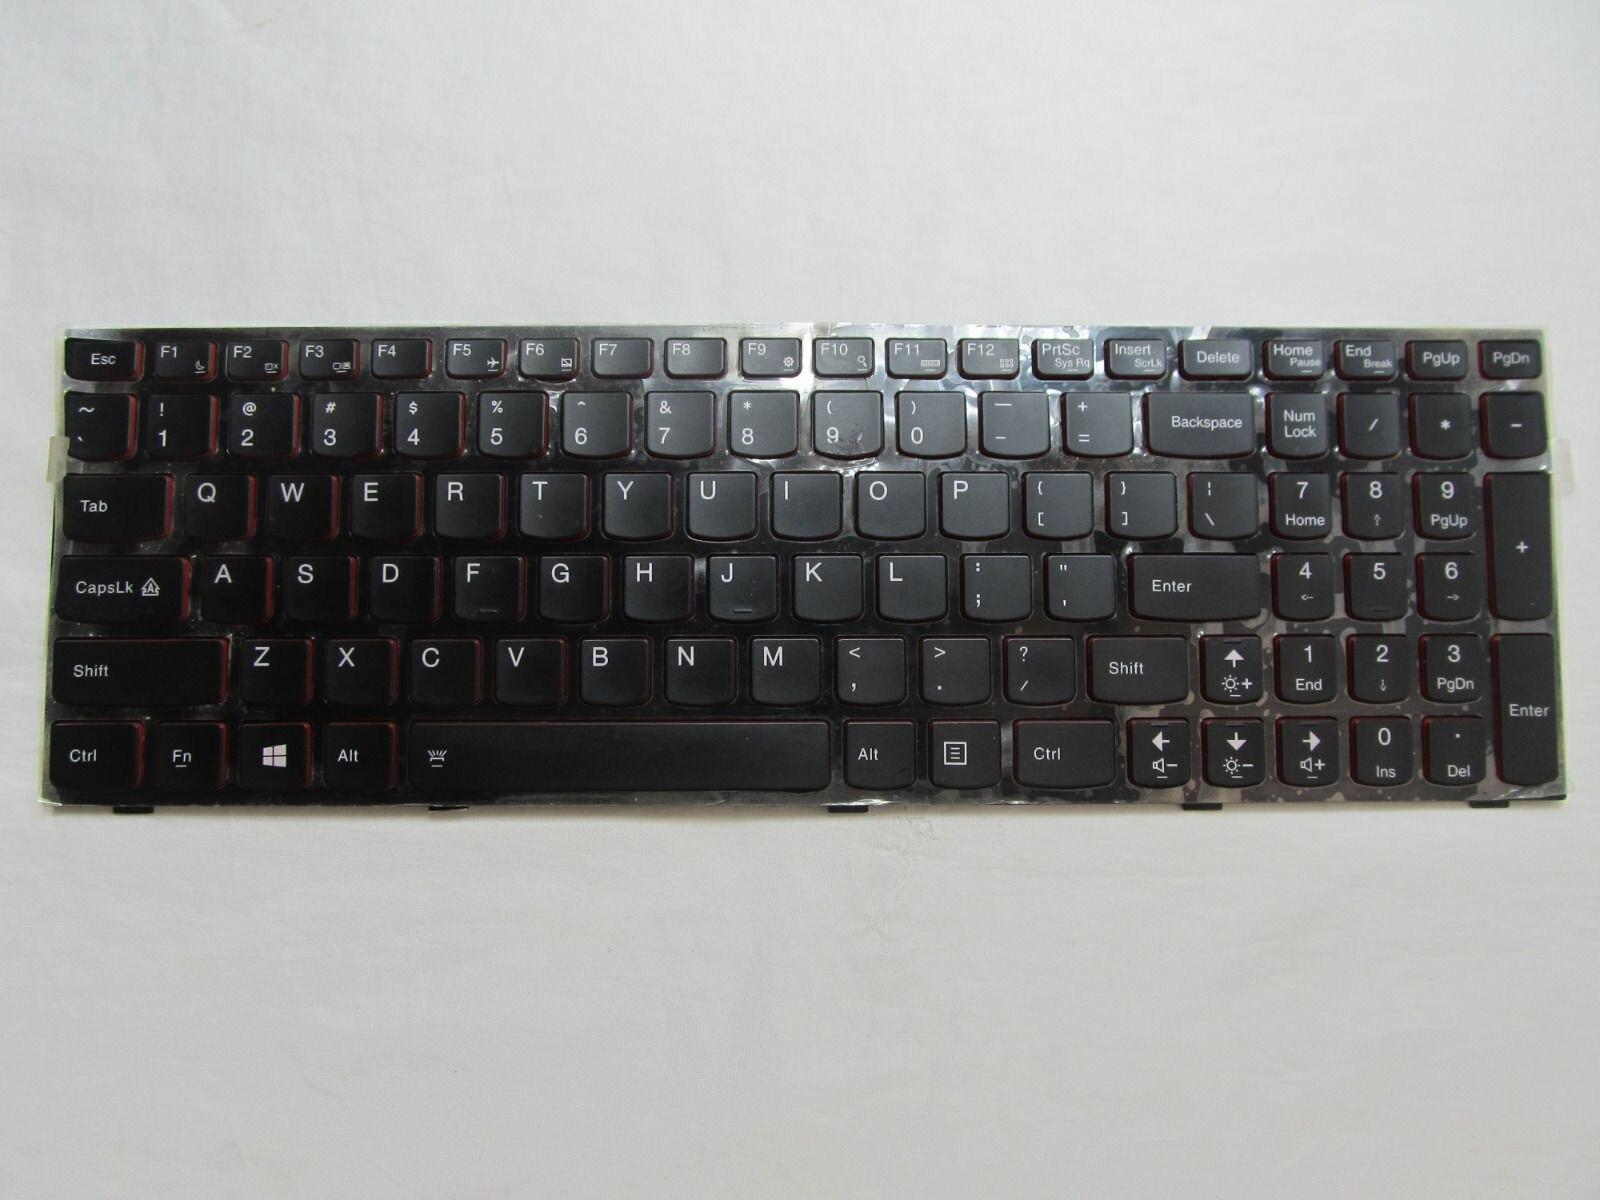 OEM for IBM/Lenovo Y500 Y500N Y500NT Laptop Keyboard 9Z.N5SBC.401 25205474 new notebook laptop keyboard for lenovo ideapad y500 y500n y500nt backlit gr german layout